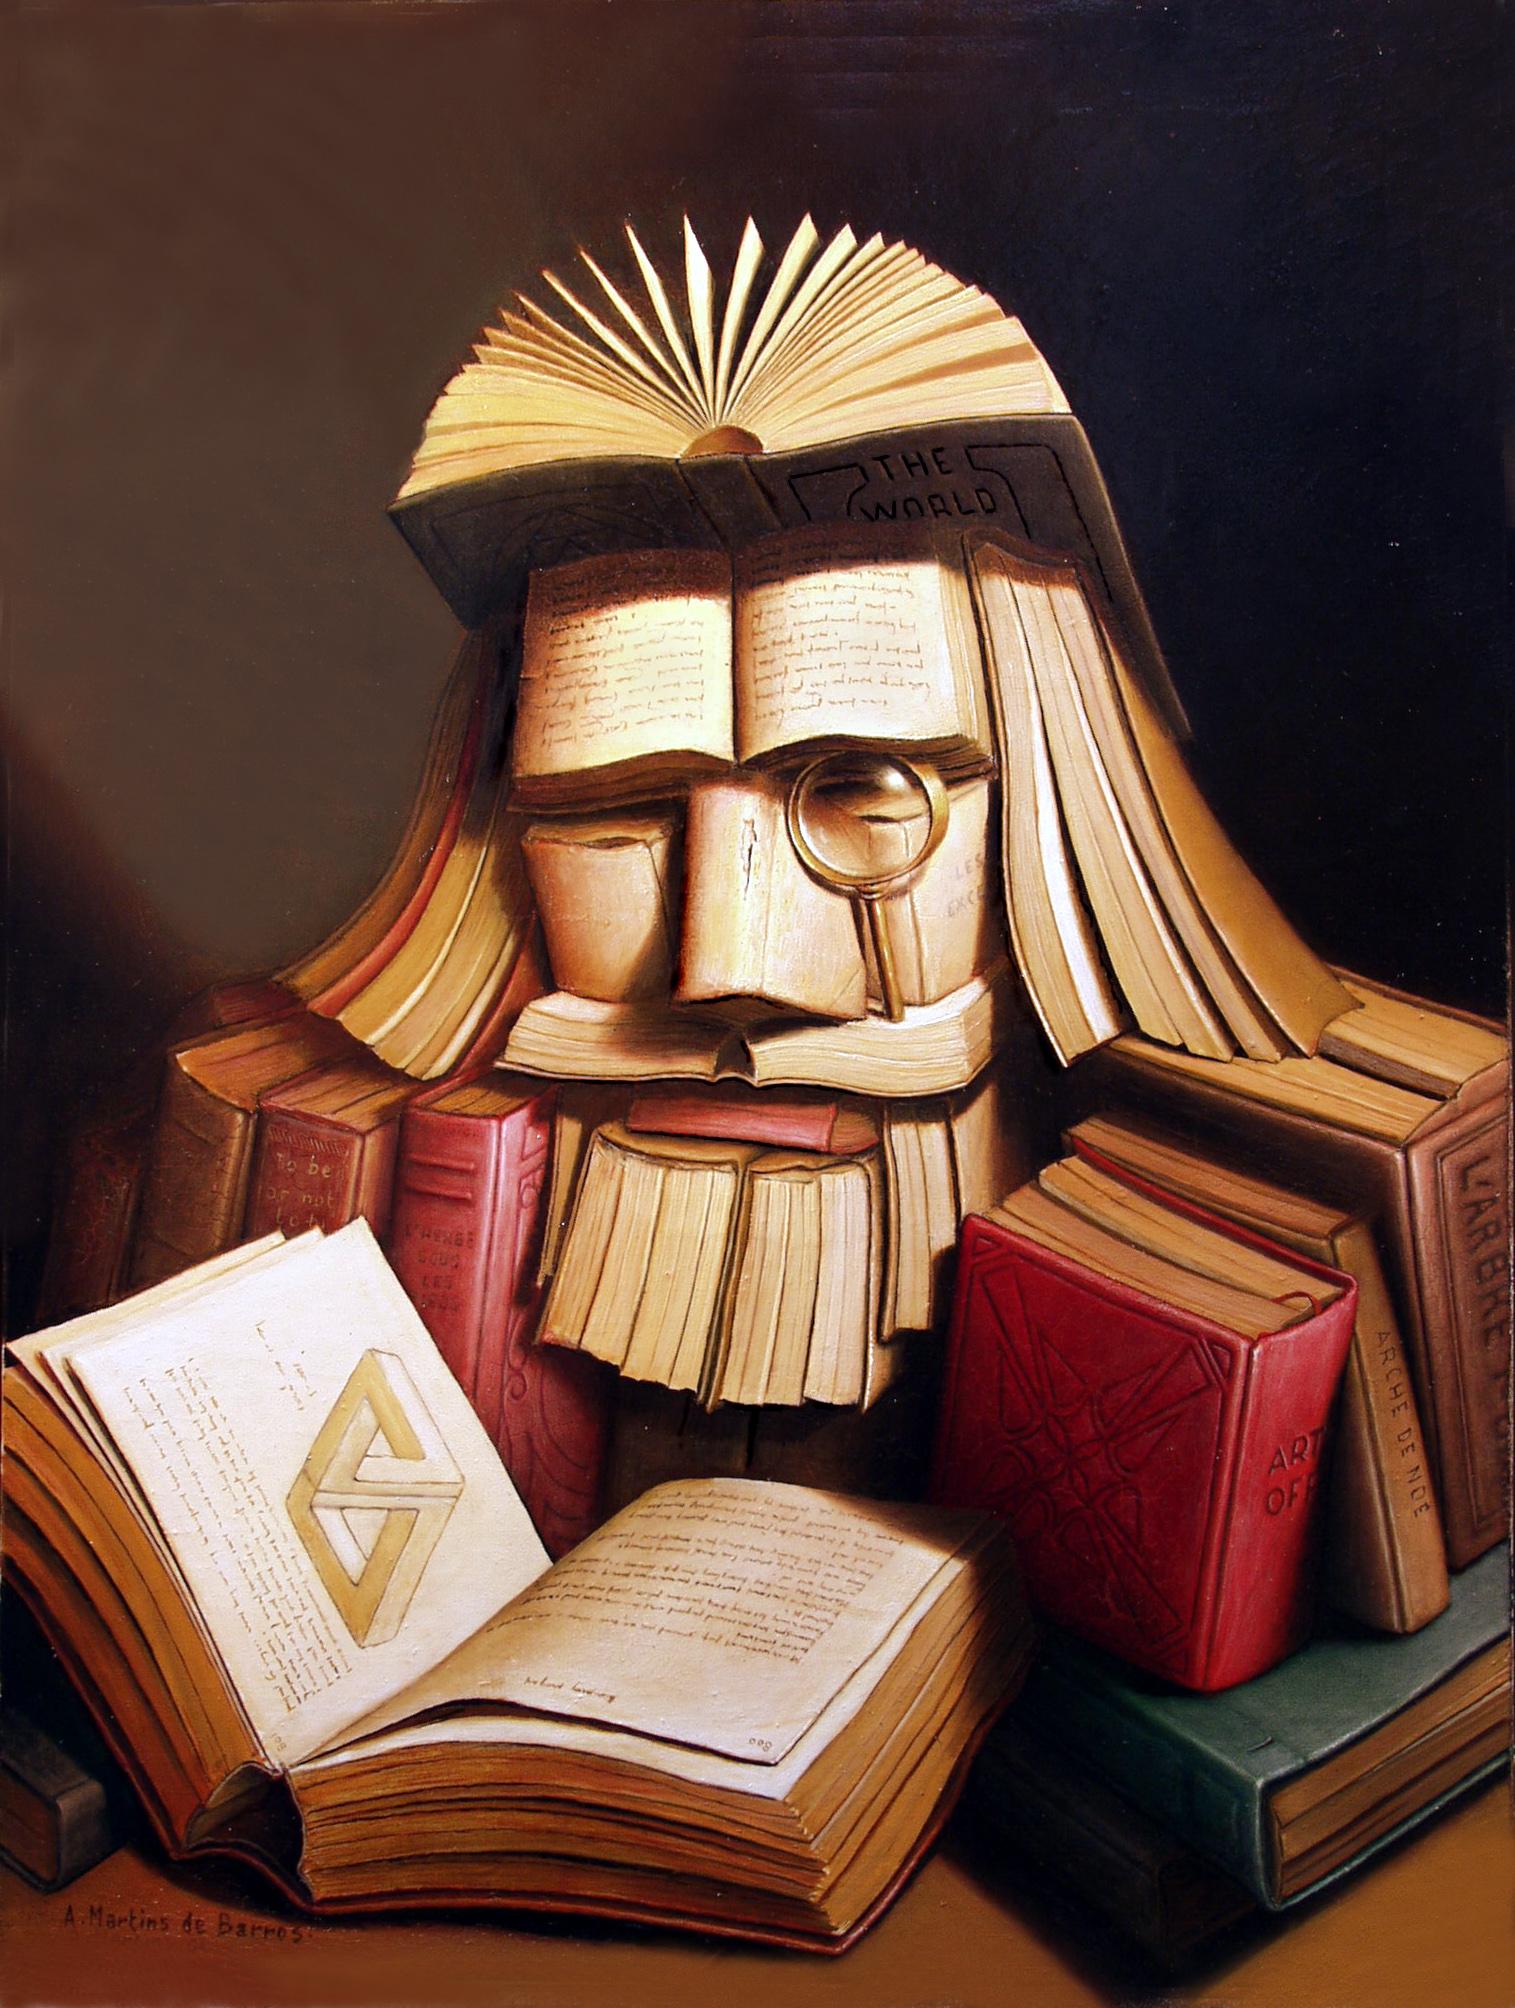 Андрэ де Барро «Книготорговец», конец 20 в.